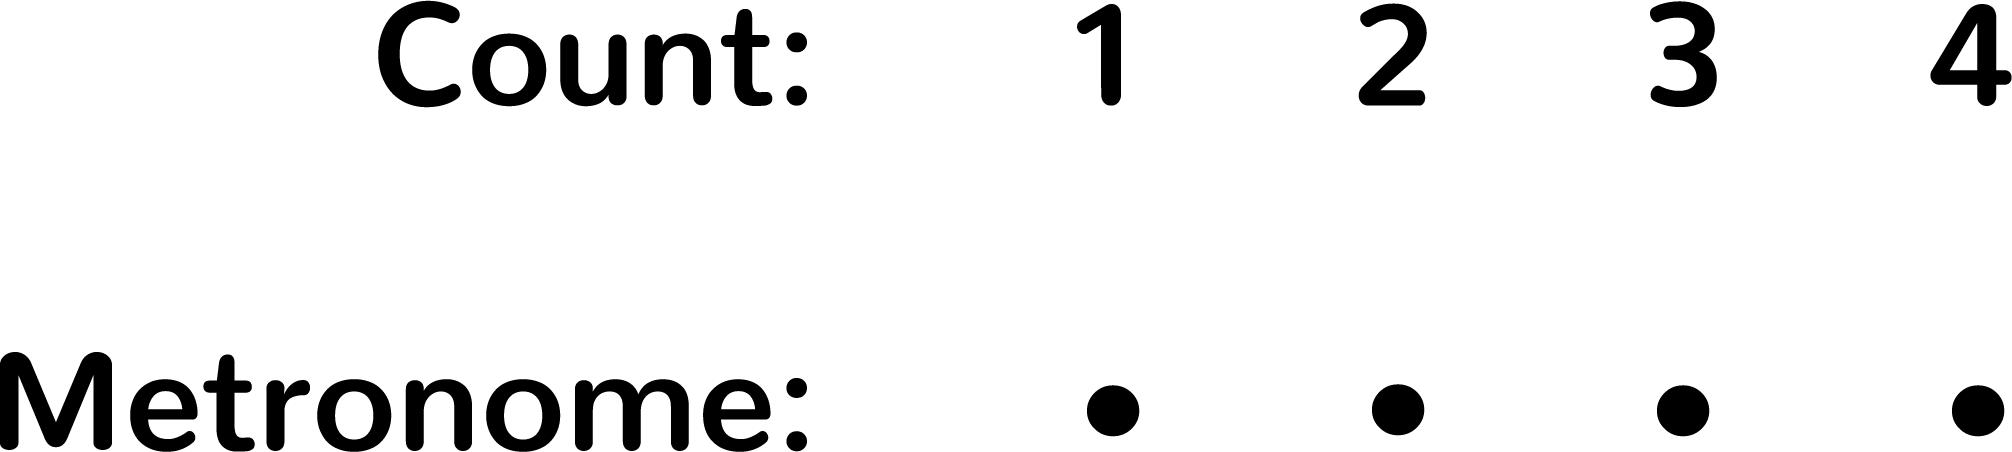 Level 1 Metronome Exercise